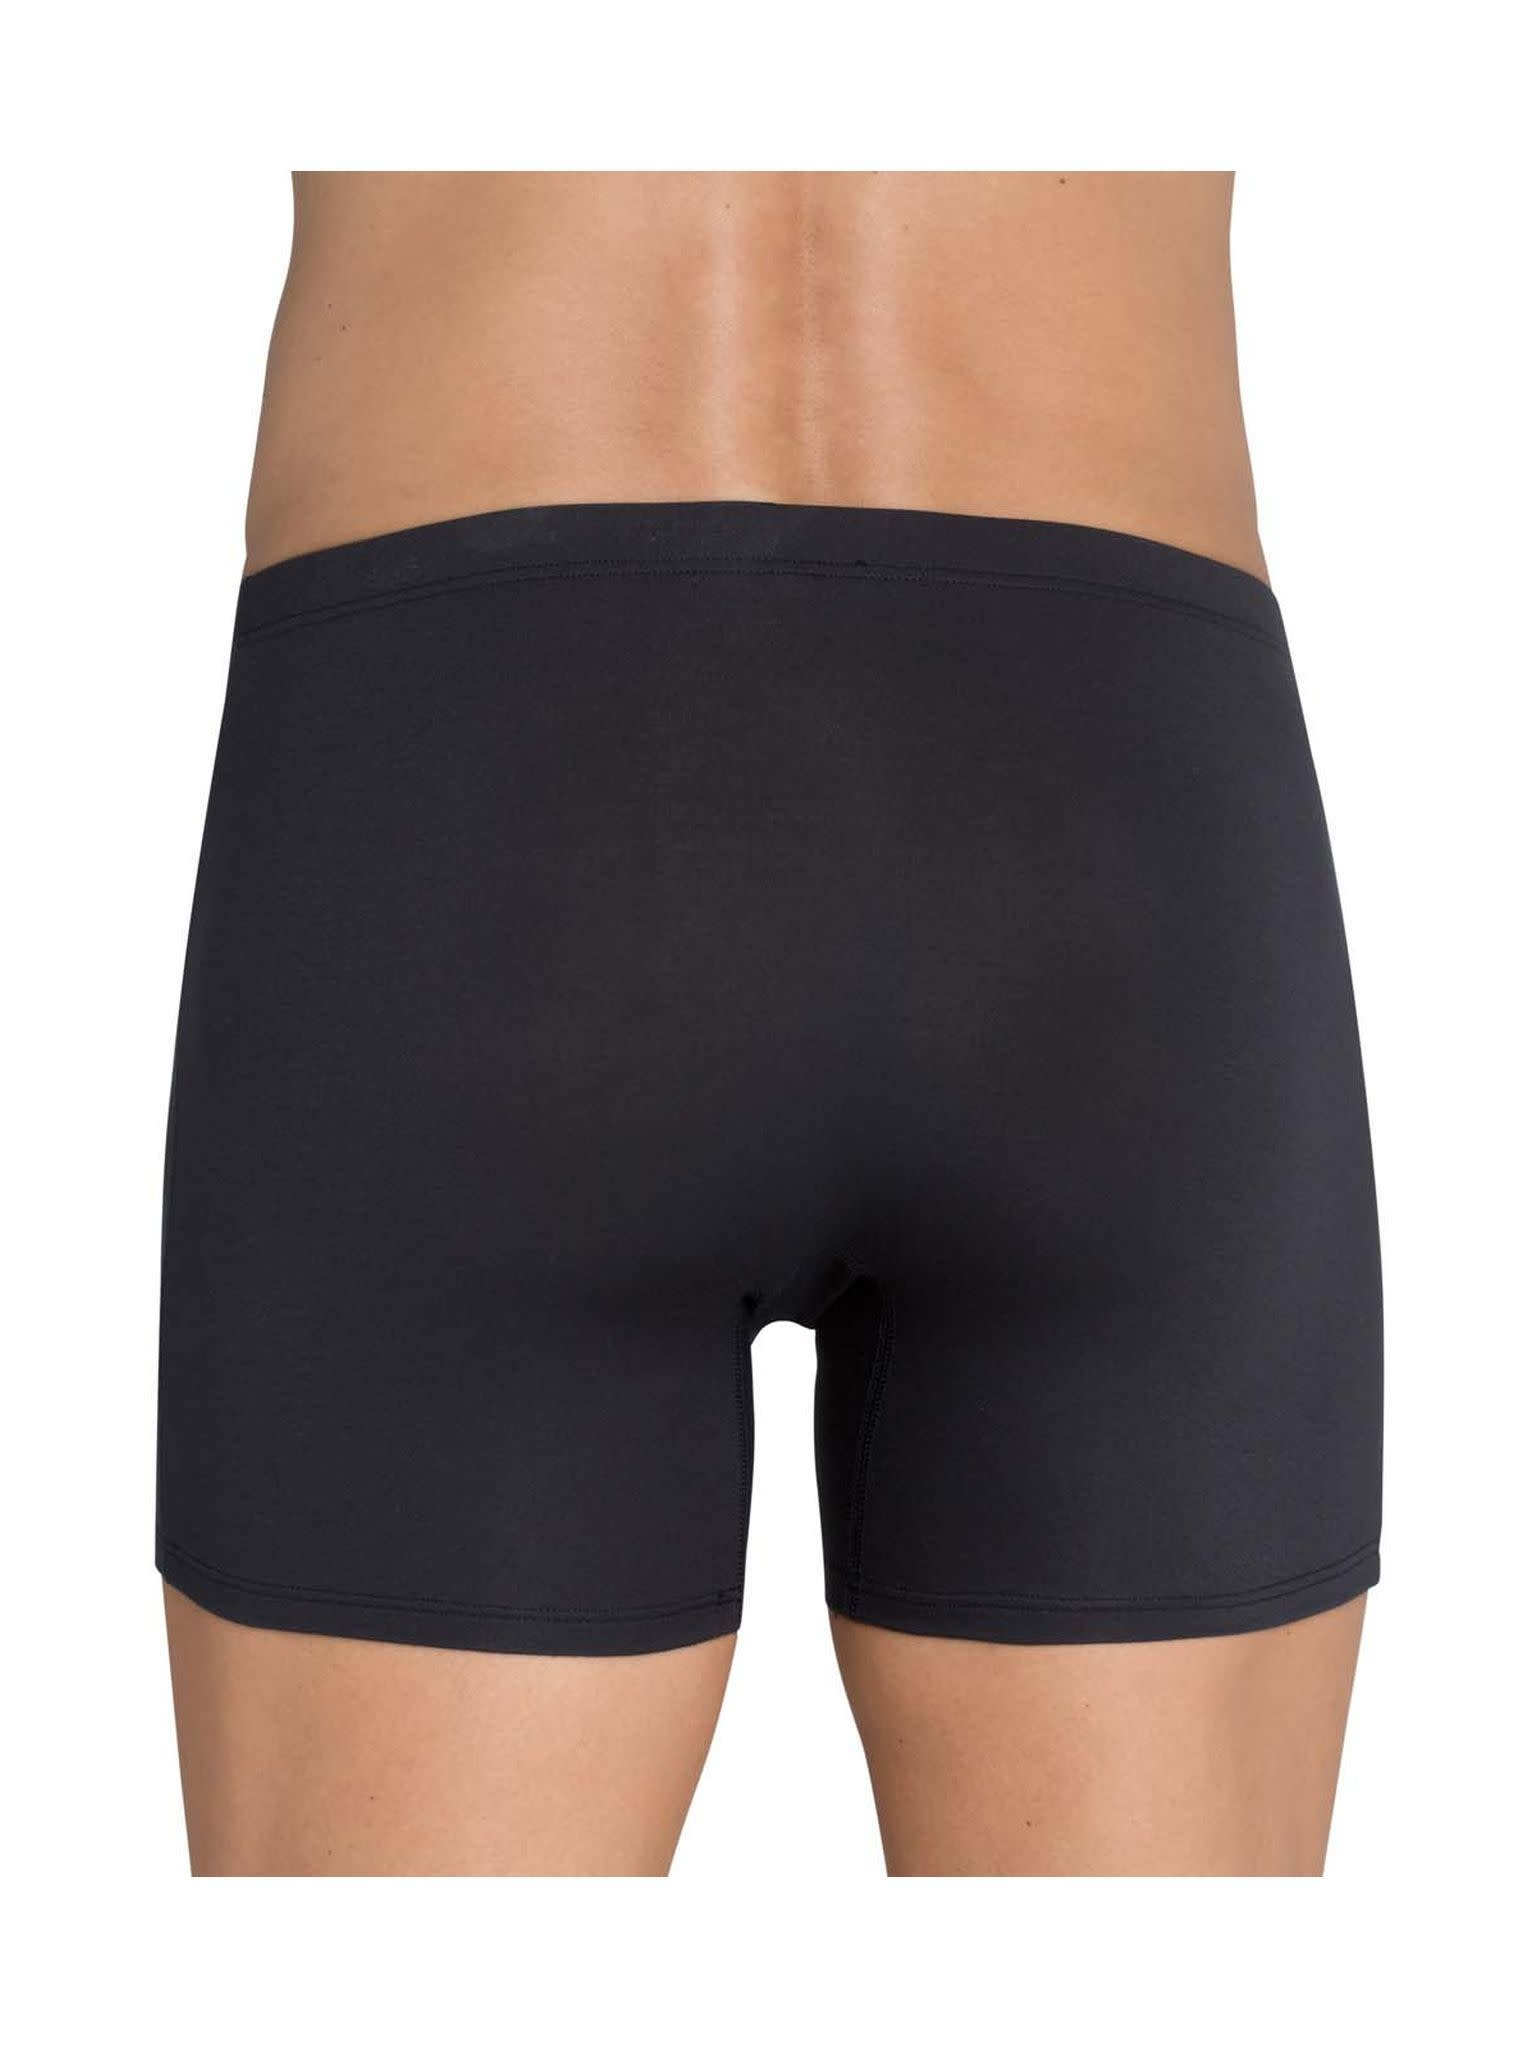 Short Basic Soft 10167209 - zwart-2